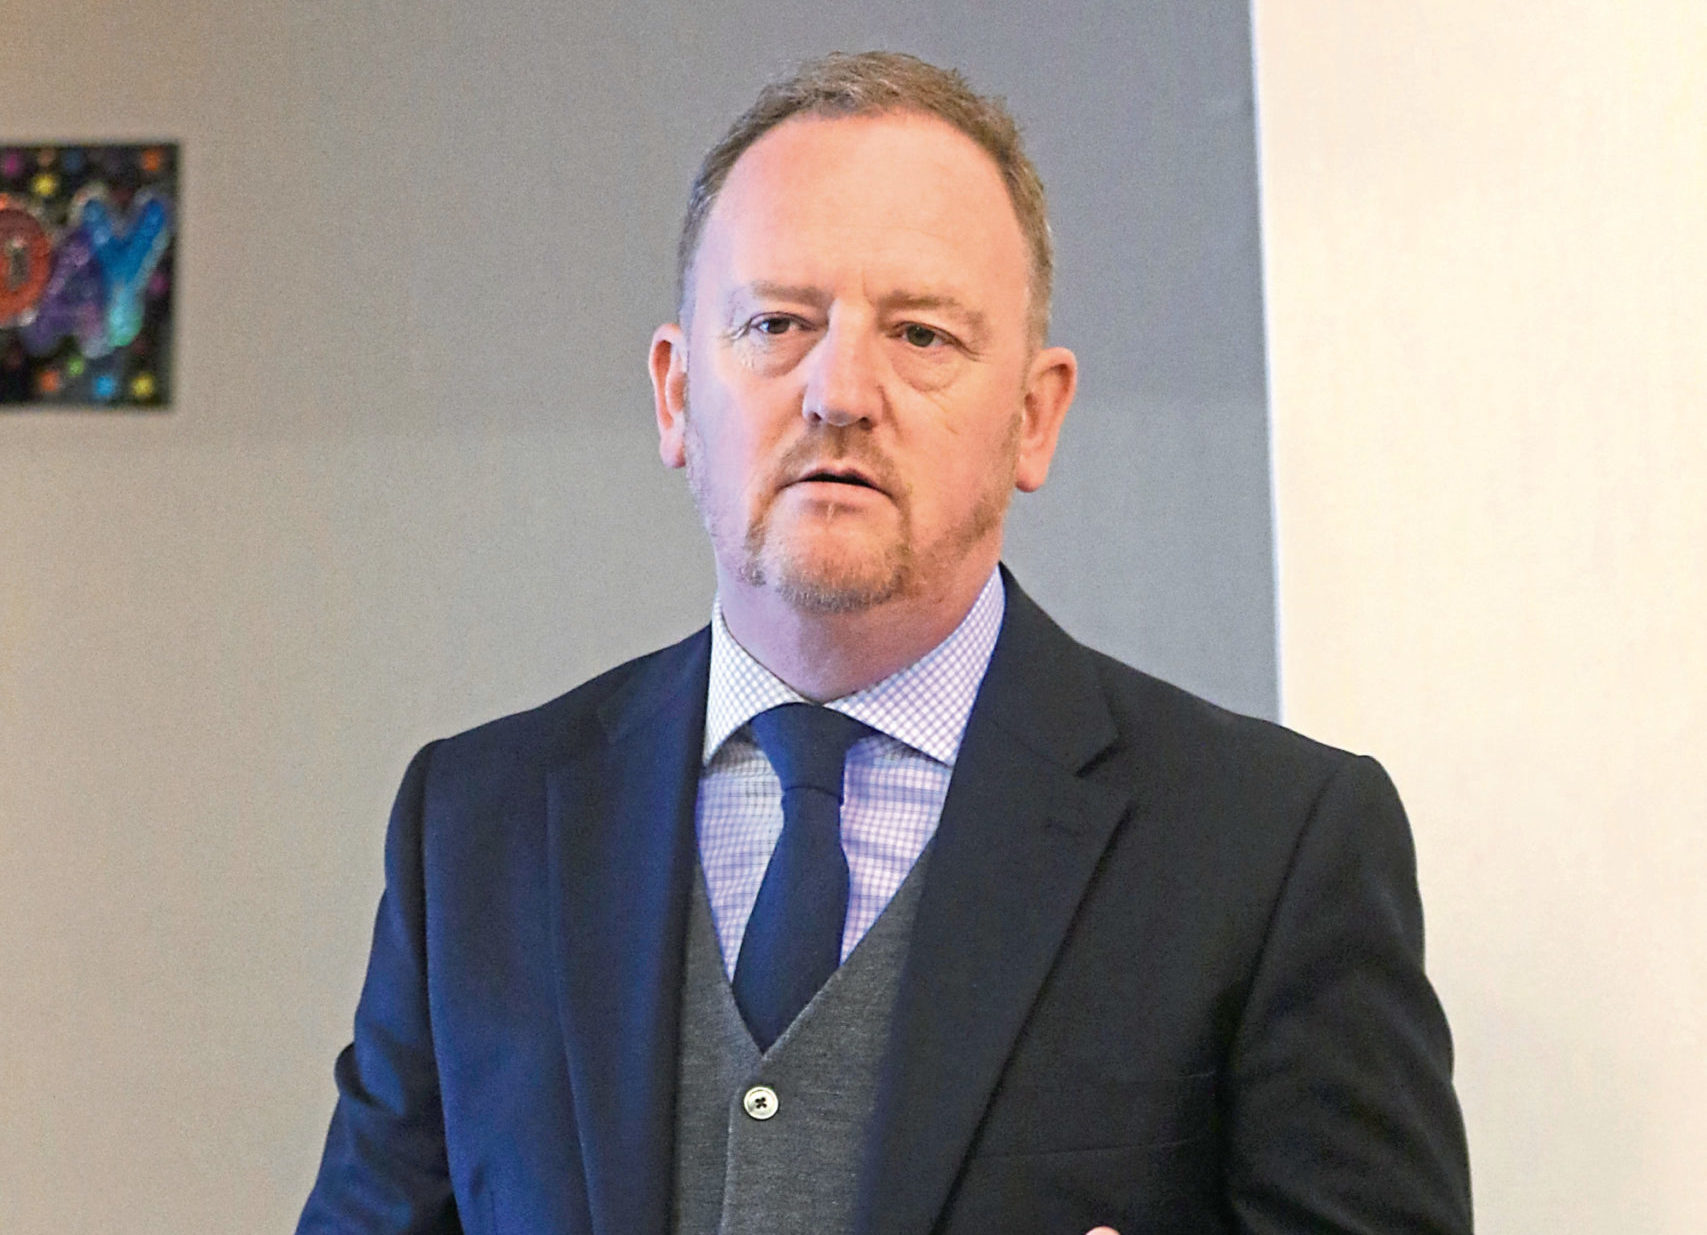 Caley Thistle chief executive Scot Gardiner.